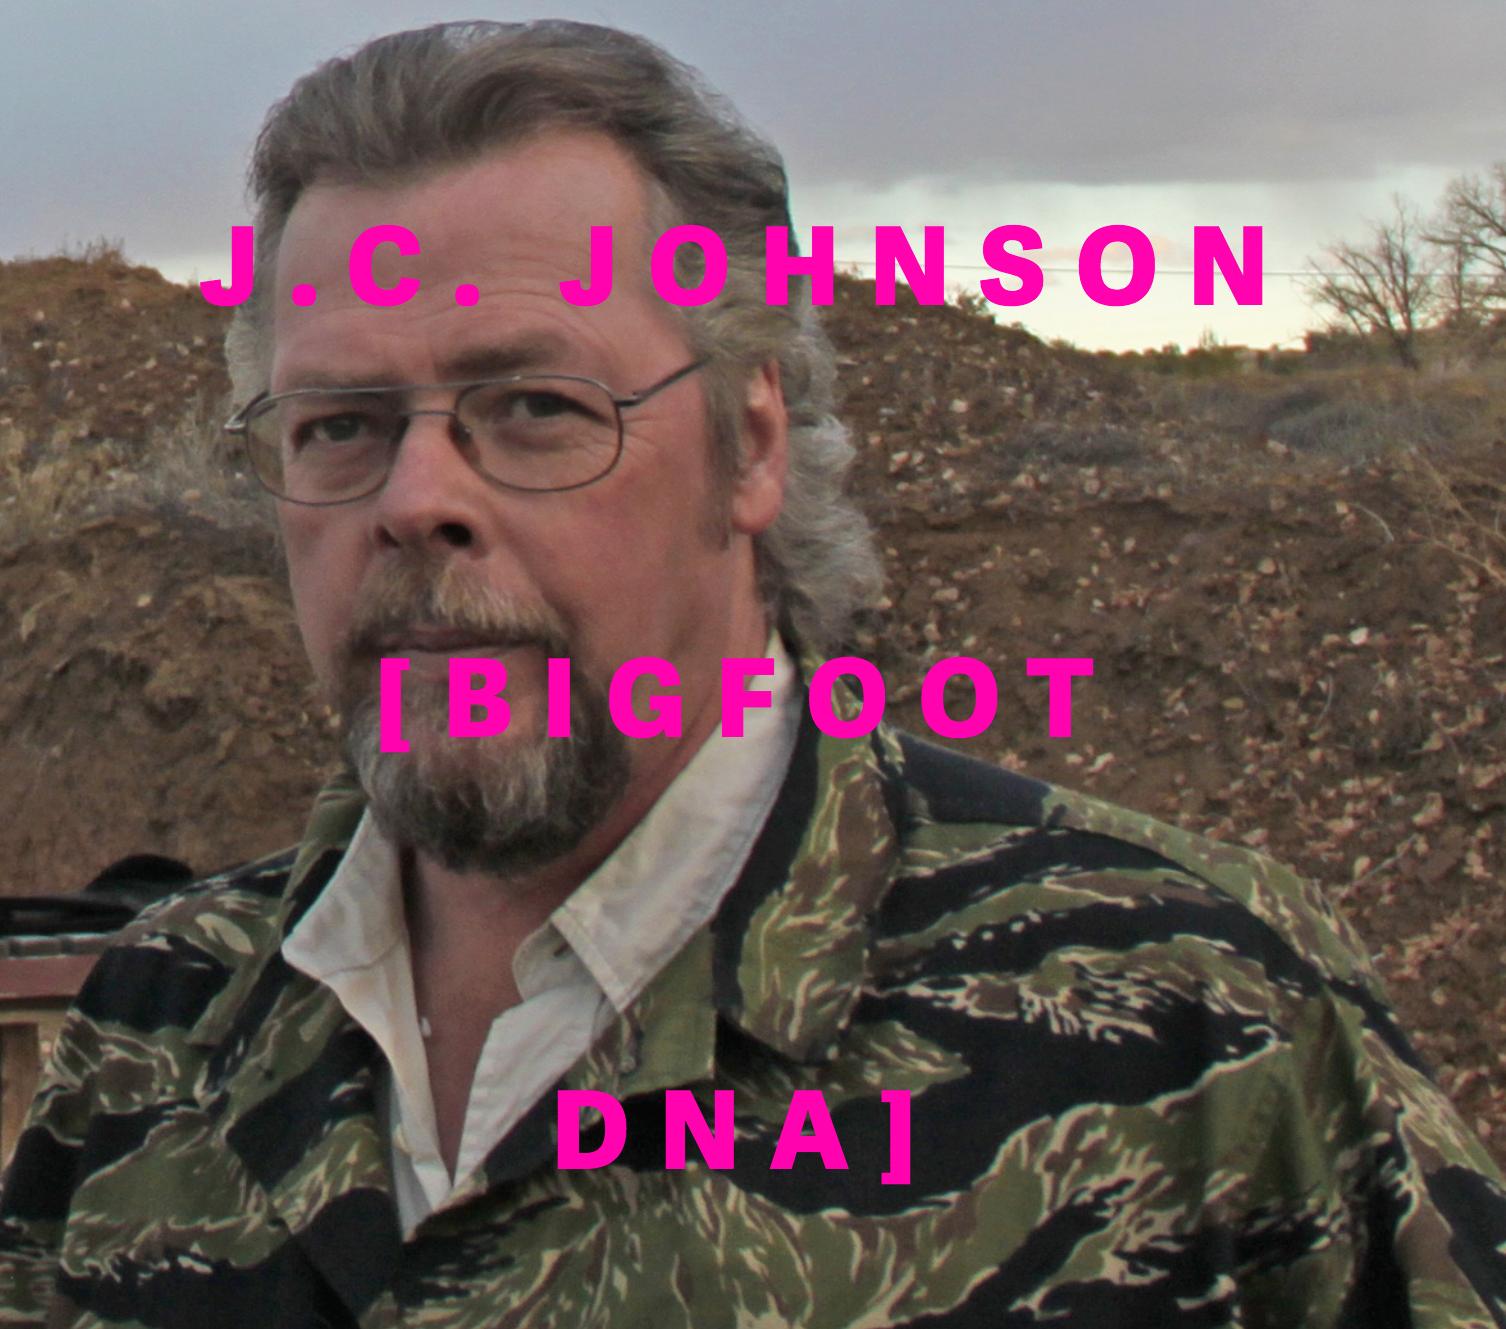 J.C. JOHNSON  #015-BIGFOOT DNA